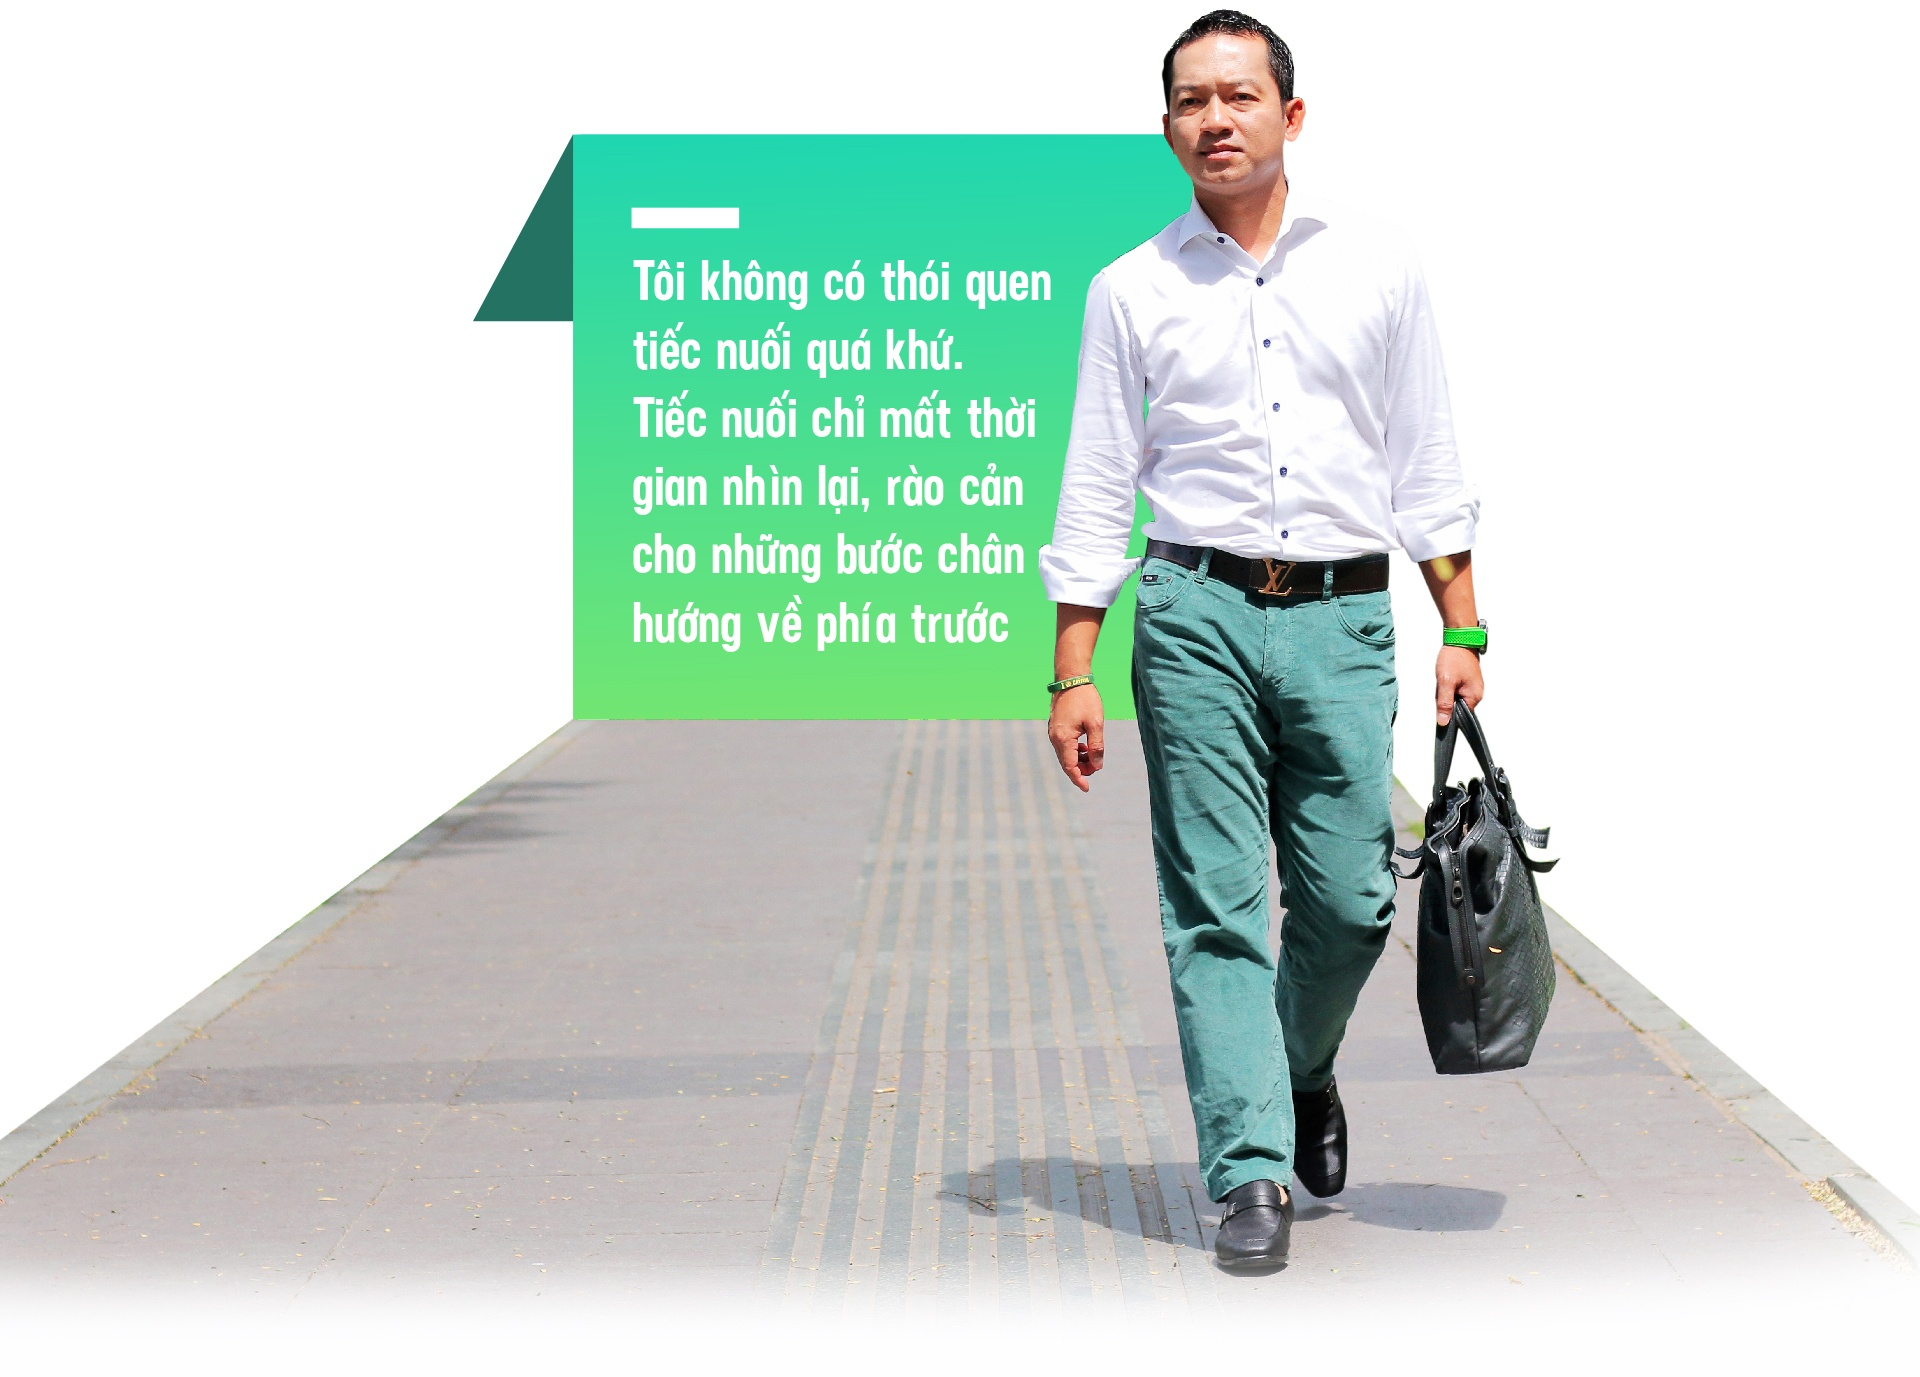 'Bau' Nam va thanh qua goi von nghin ty sau 1 thang khoi nghiep hinh anh 7